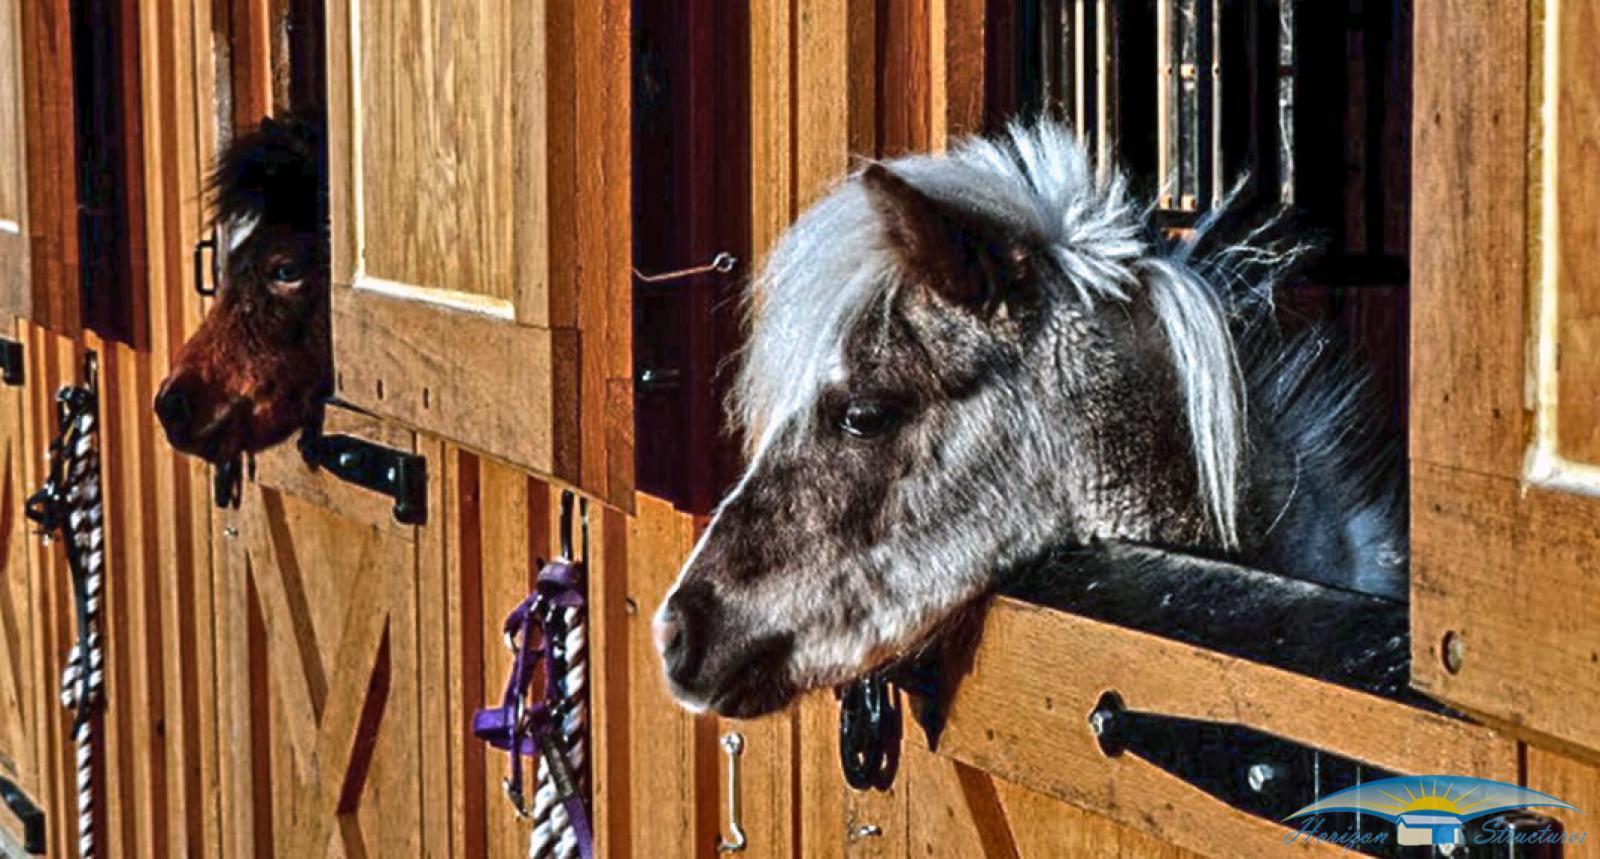 horse-barns-miniature-barns-8x24-mini-shed-row-ponies_0